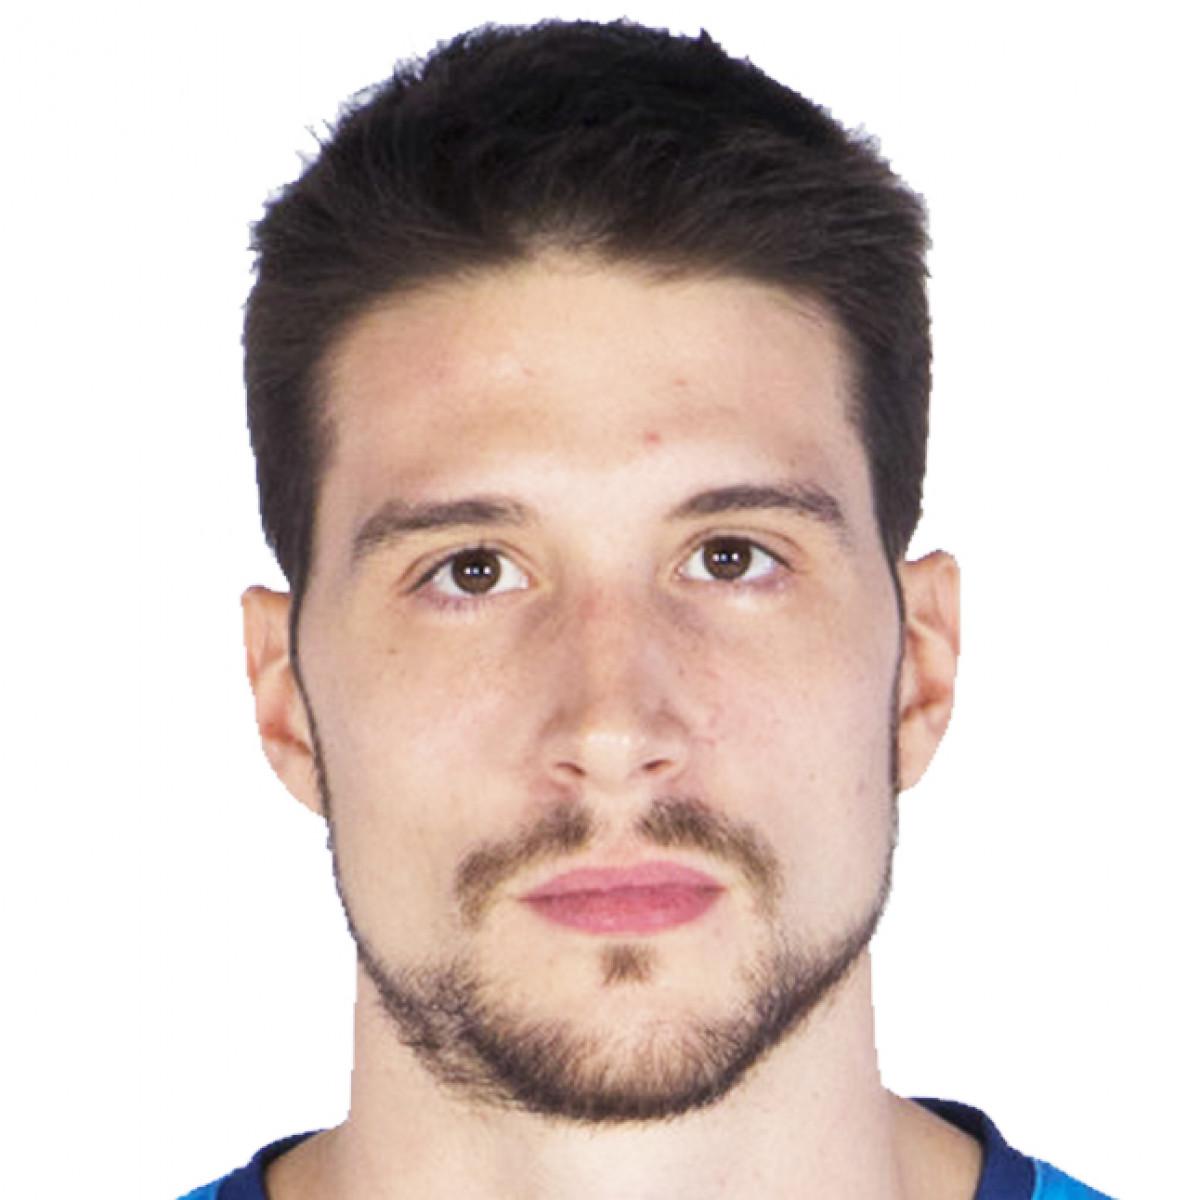 Victor Arteaga